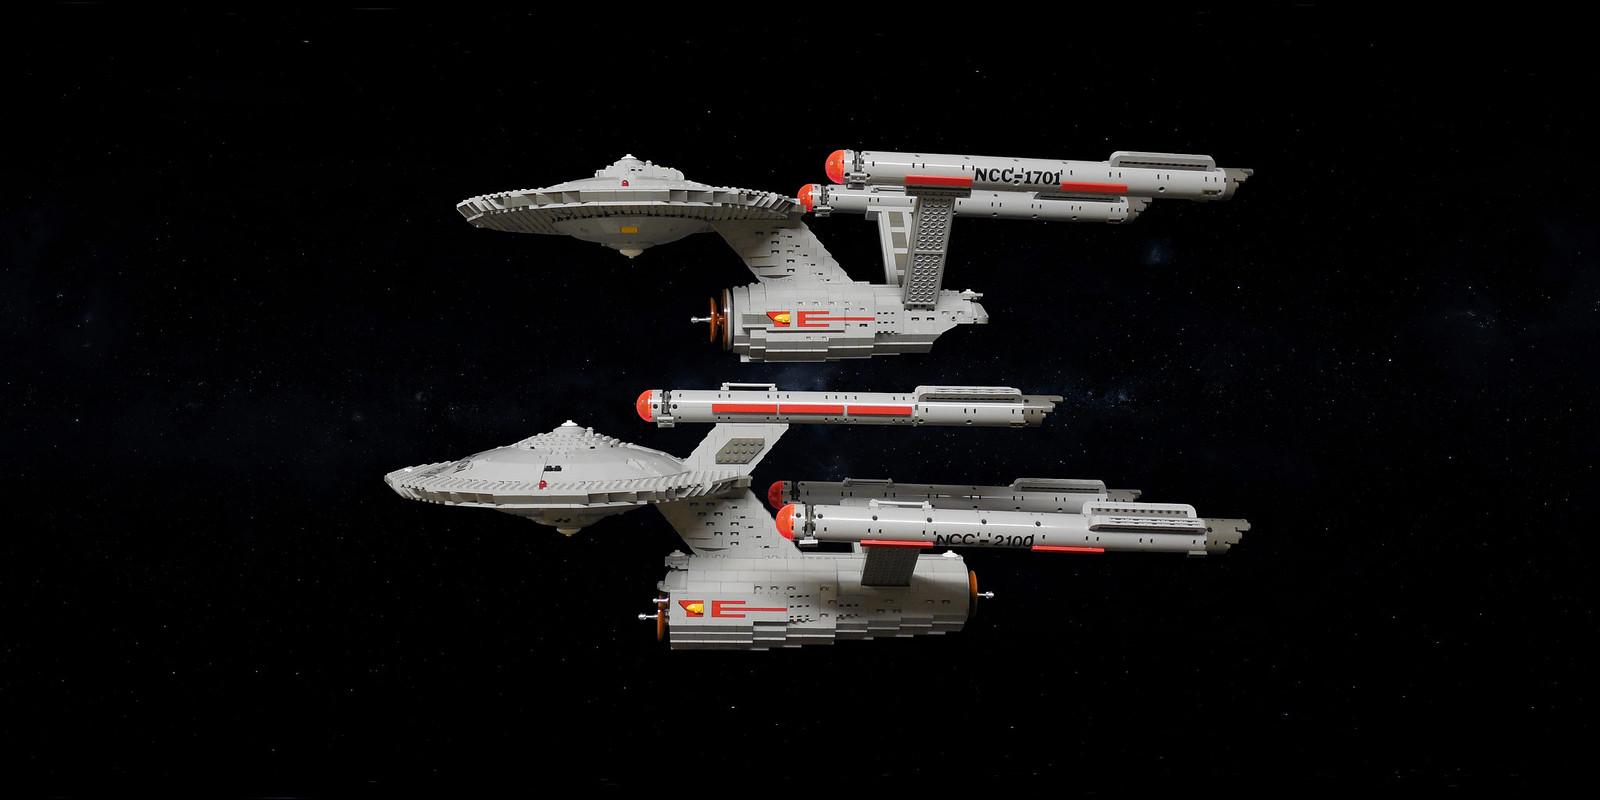 Enterprise escort duty